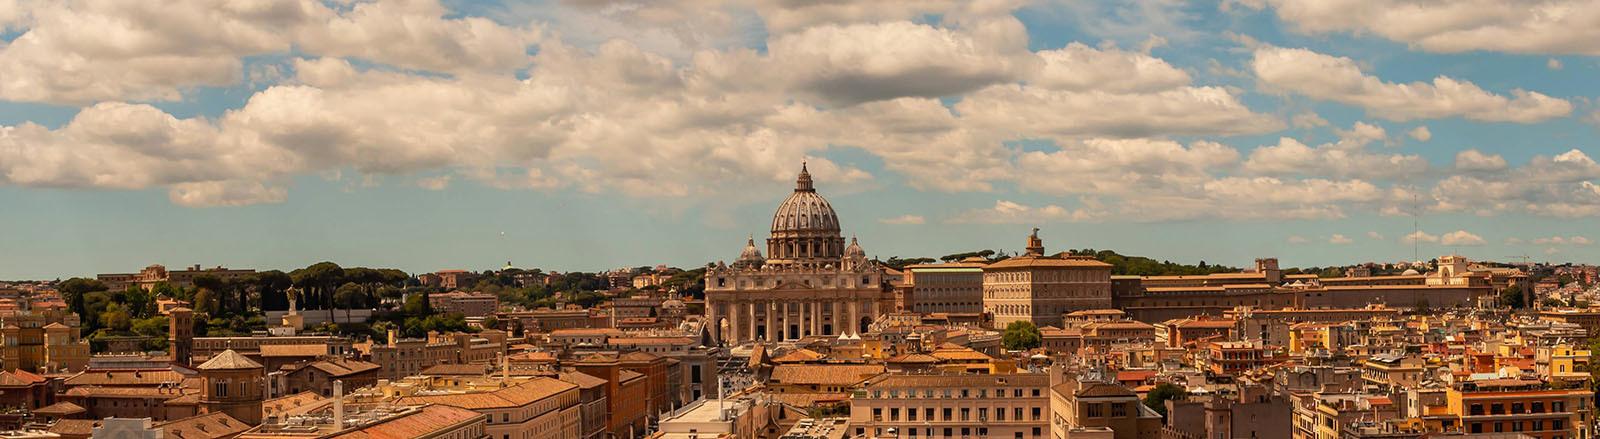 Blick auf Rom mit dem Petersdom.